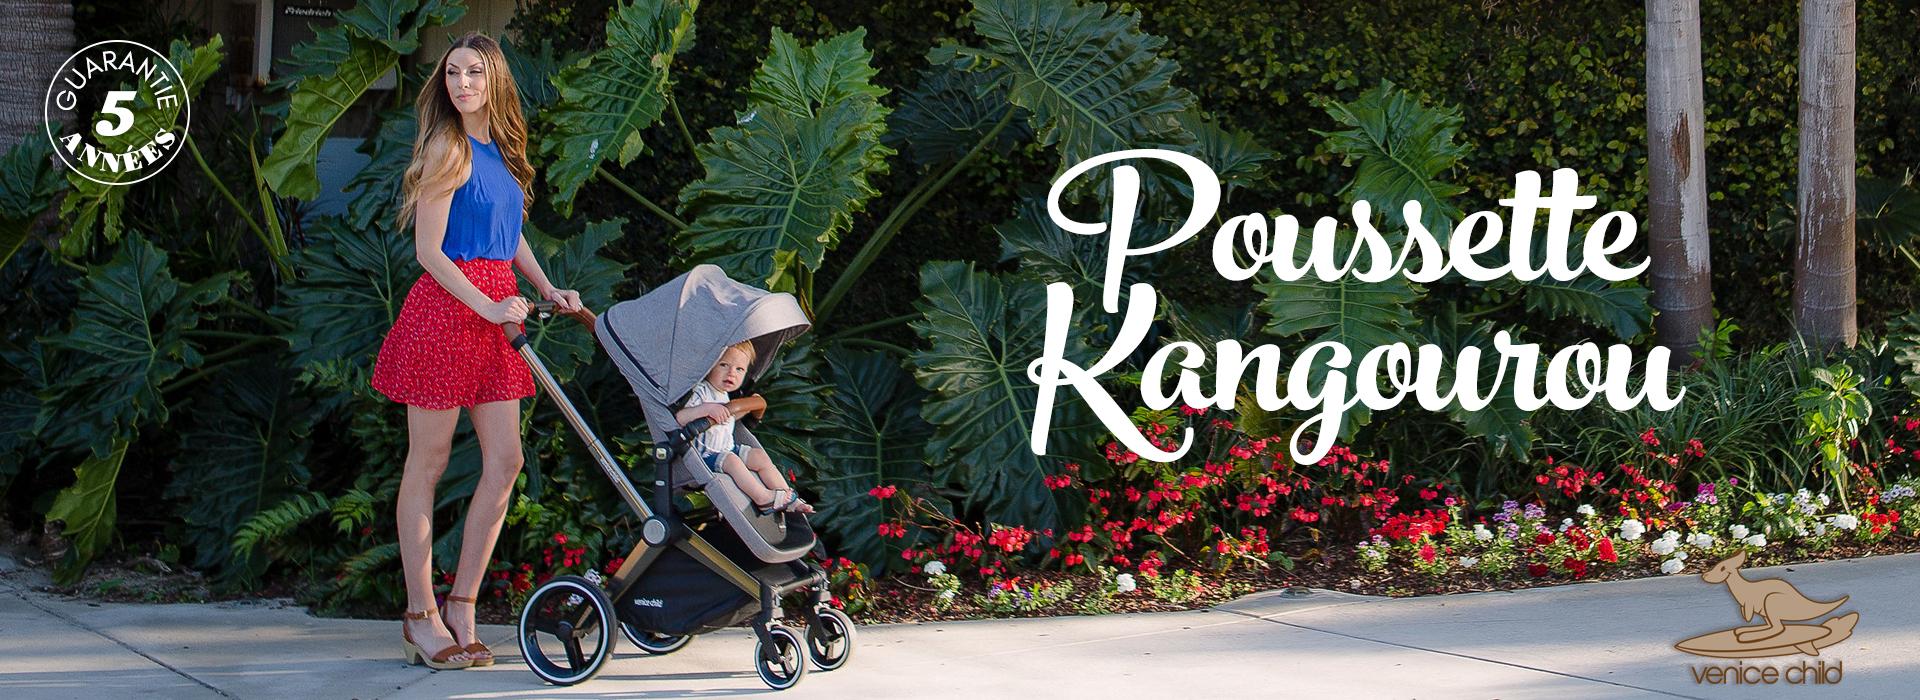 Venice Child - Poussette Kangourou